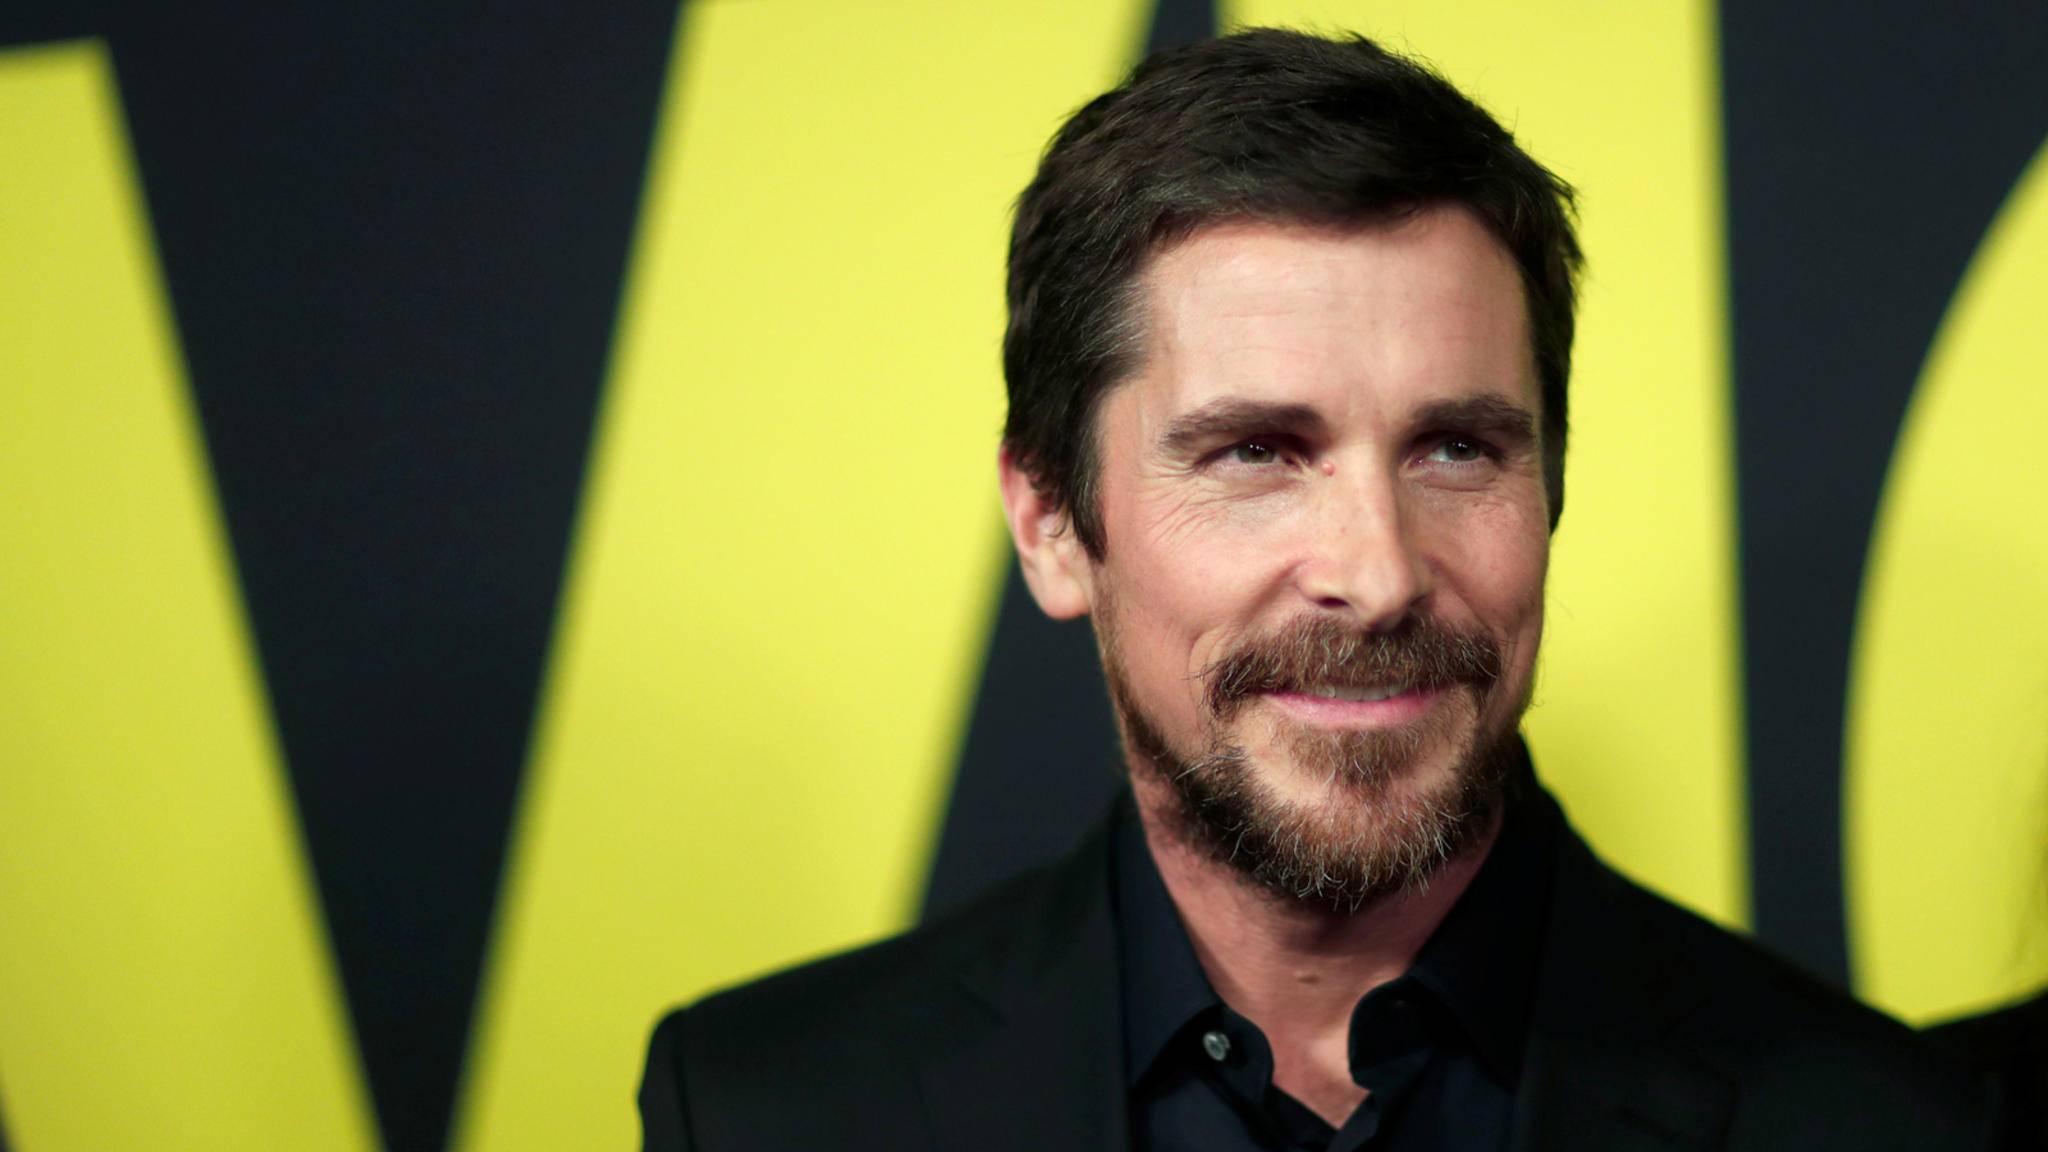 Happy Birthday, Christian Bale! Der Oscar-Preisträger feiert am 30. Januar seinen 45. Geburtstag.